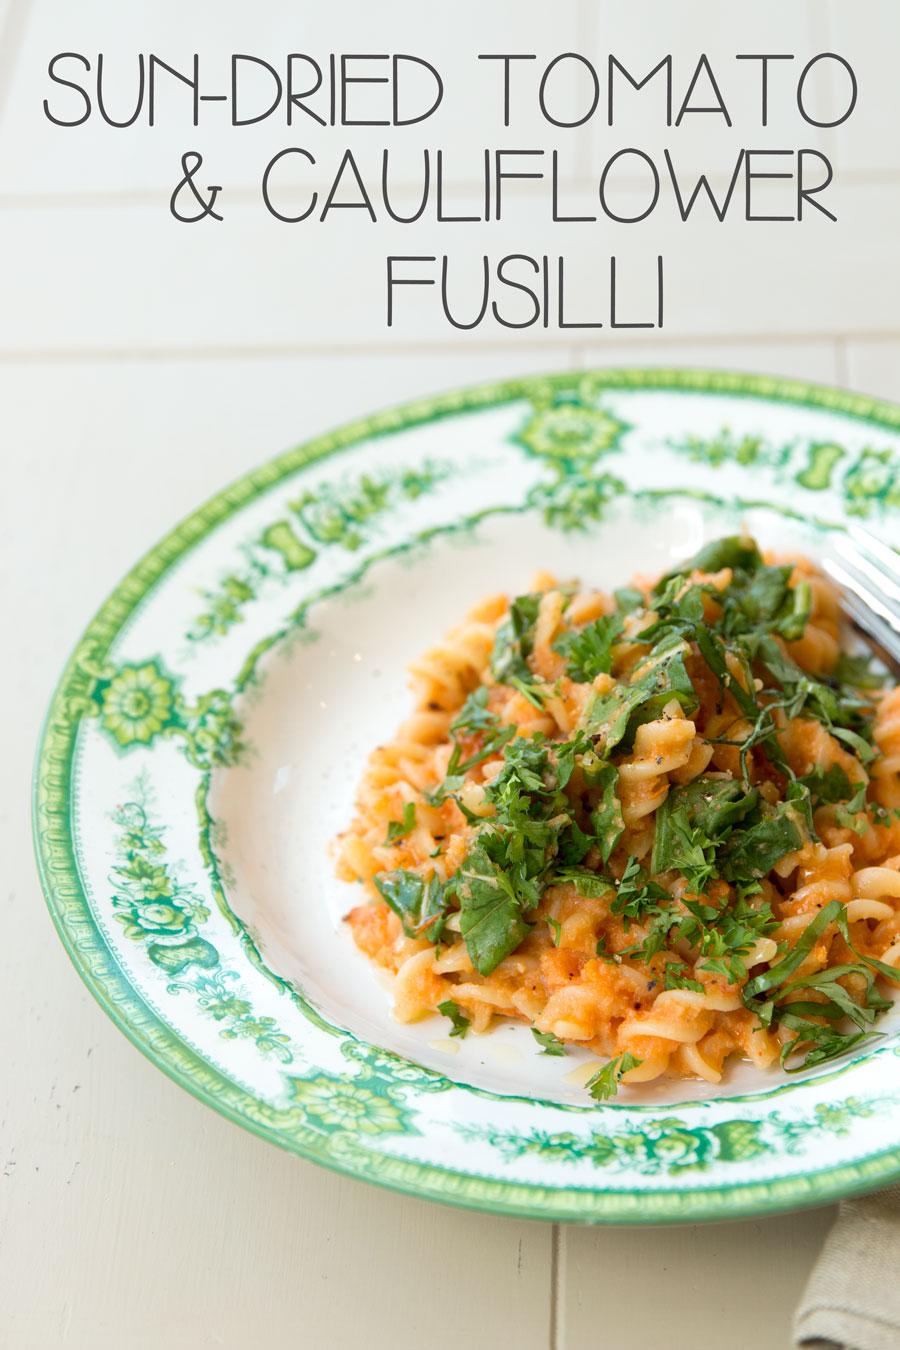 fusilli-rtdbrowning-01-text